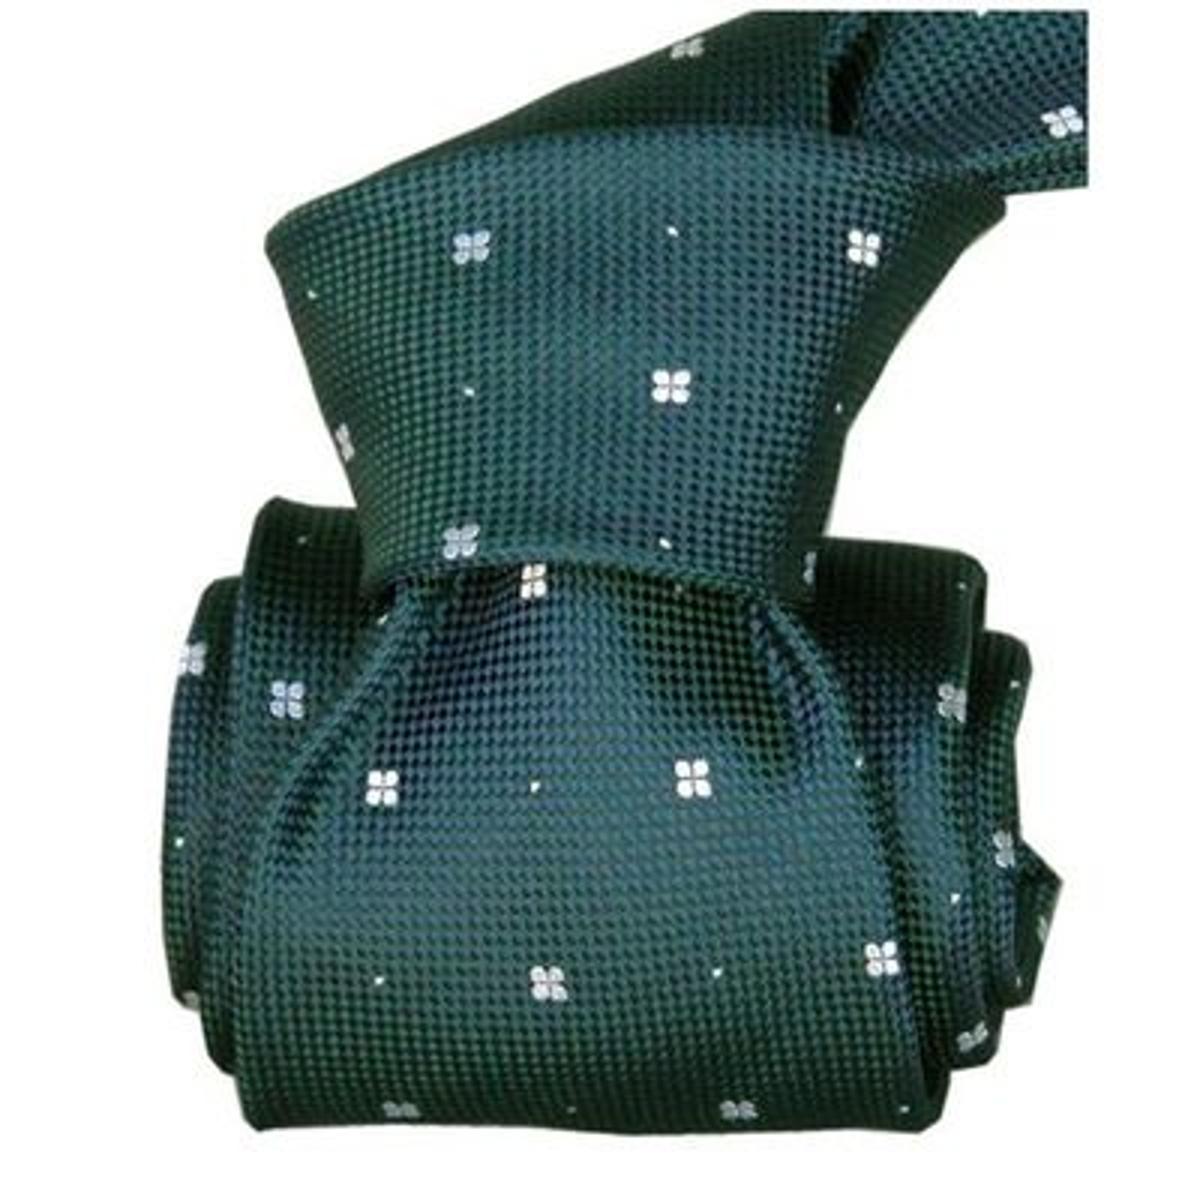 Cravate Segni Disegni LUXE, Faite main, Bolatte Bleu / vert